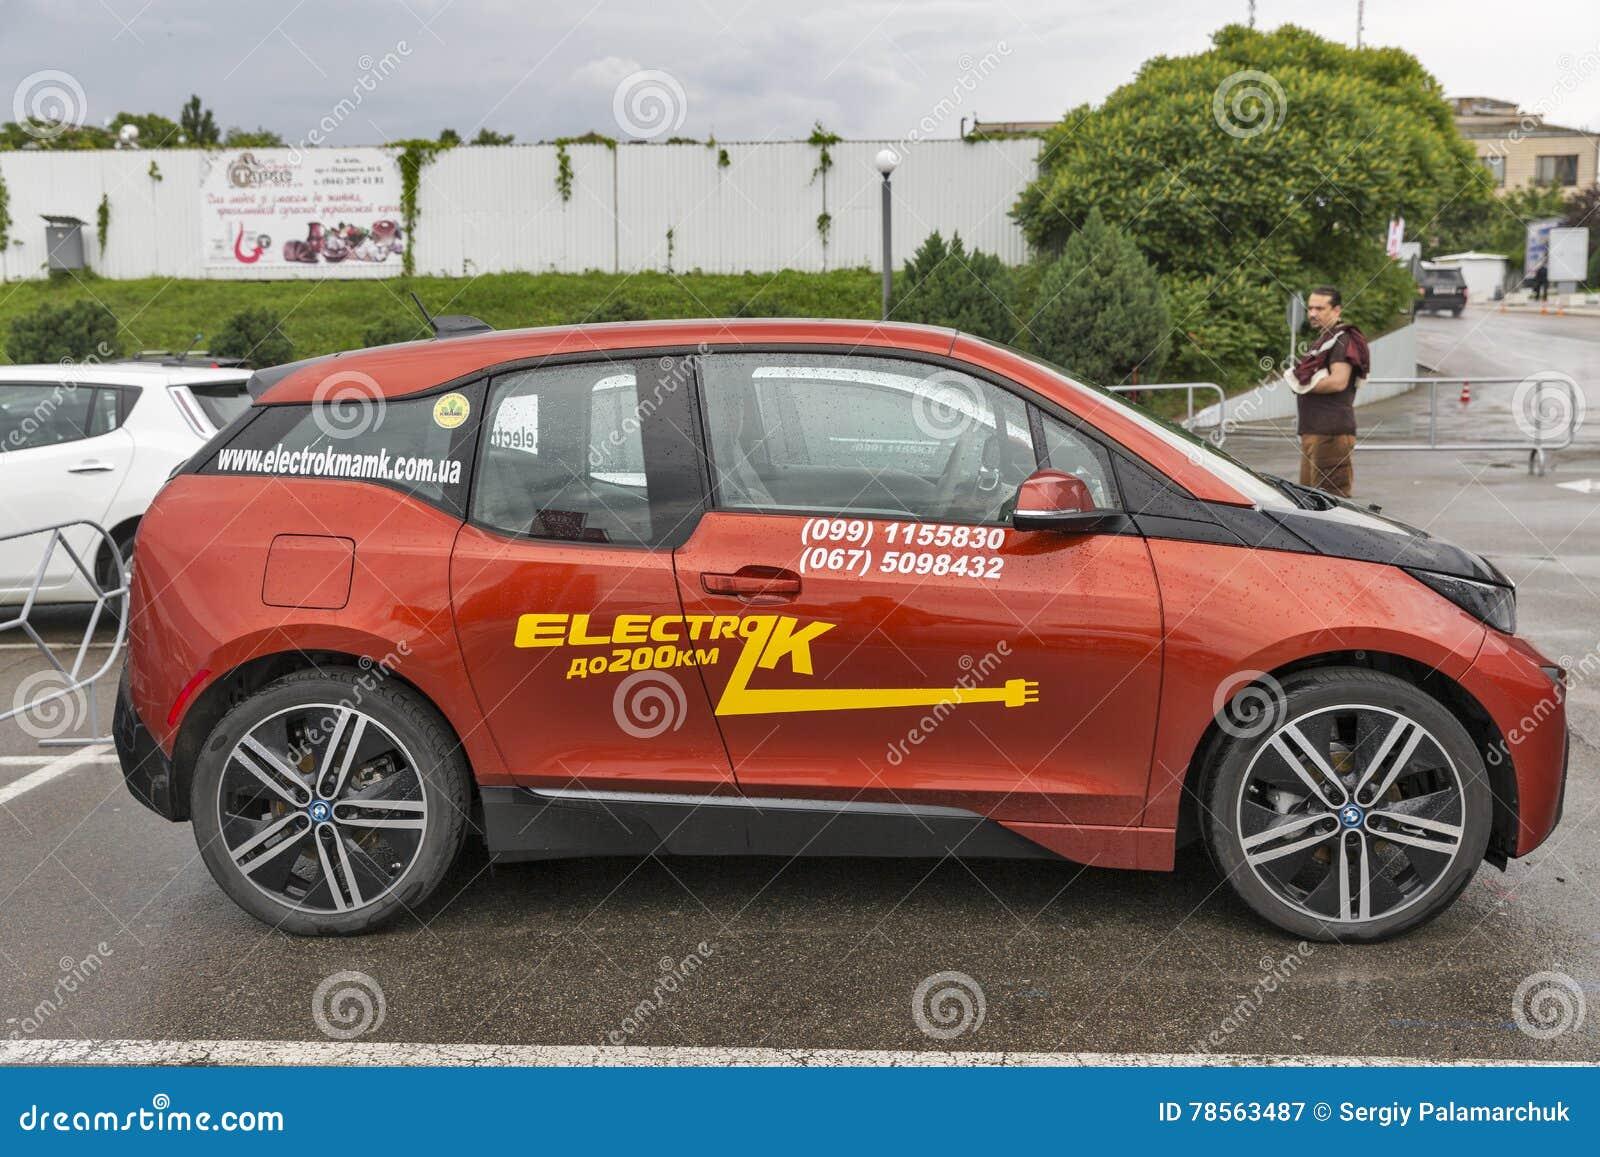 Electric Plug Electric Charge Of Bmw I3 Editorial Photo Cartoondealer Com 80748635